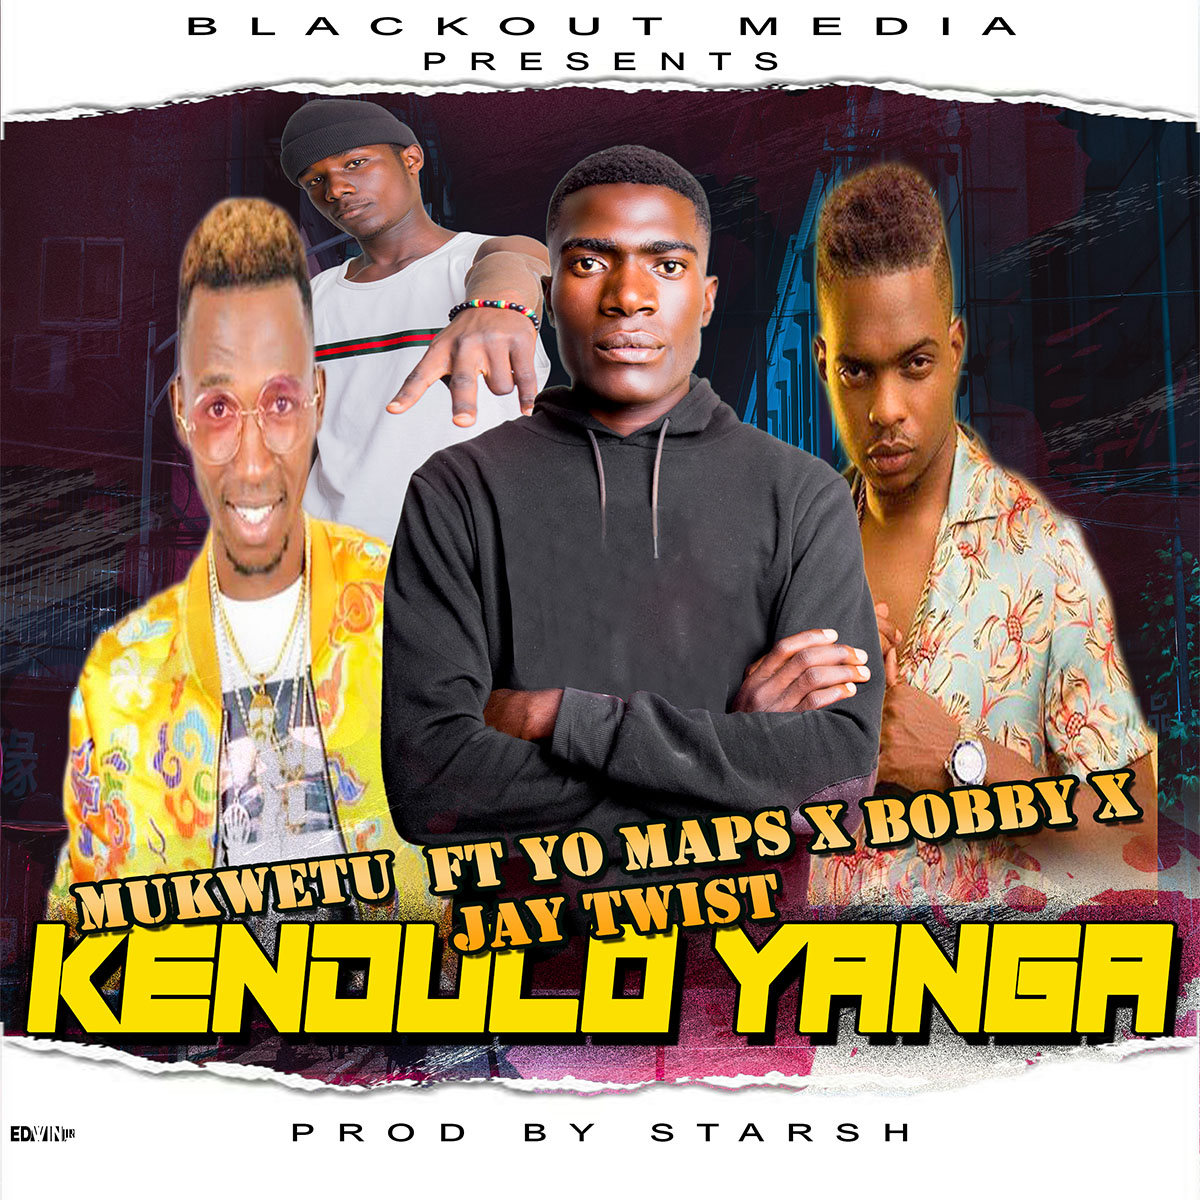 Mukwetu ft. Yo Maps & Bobby East - Kendulo Yanga